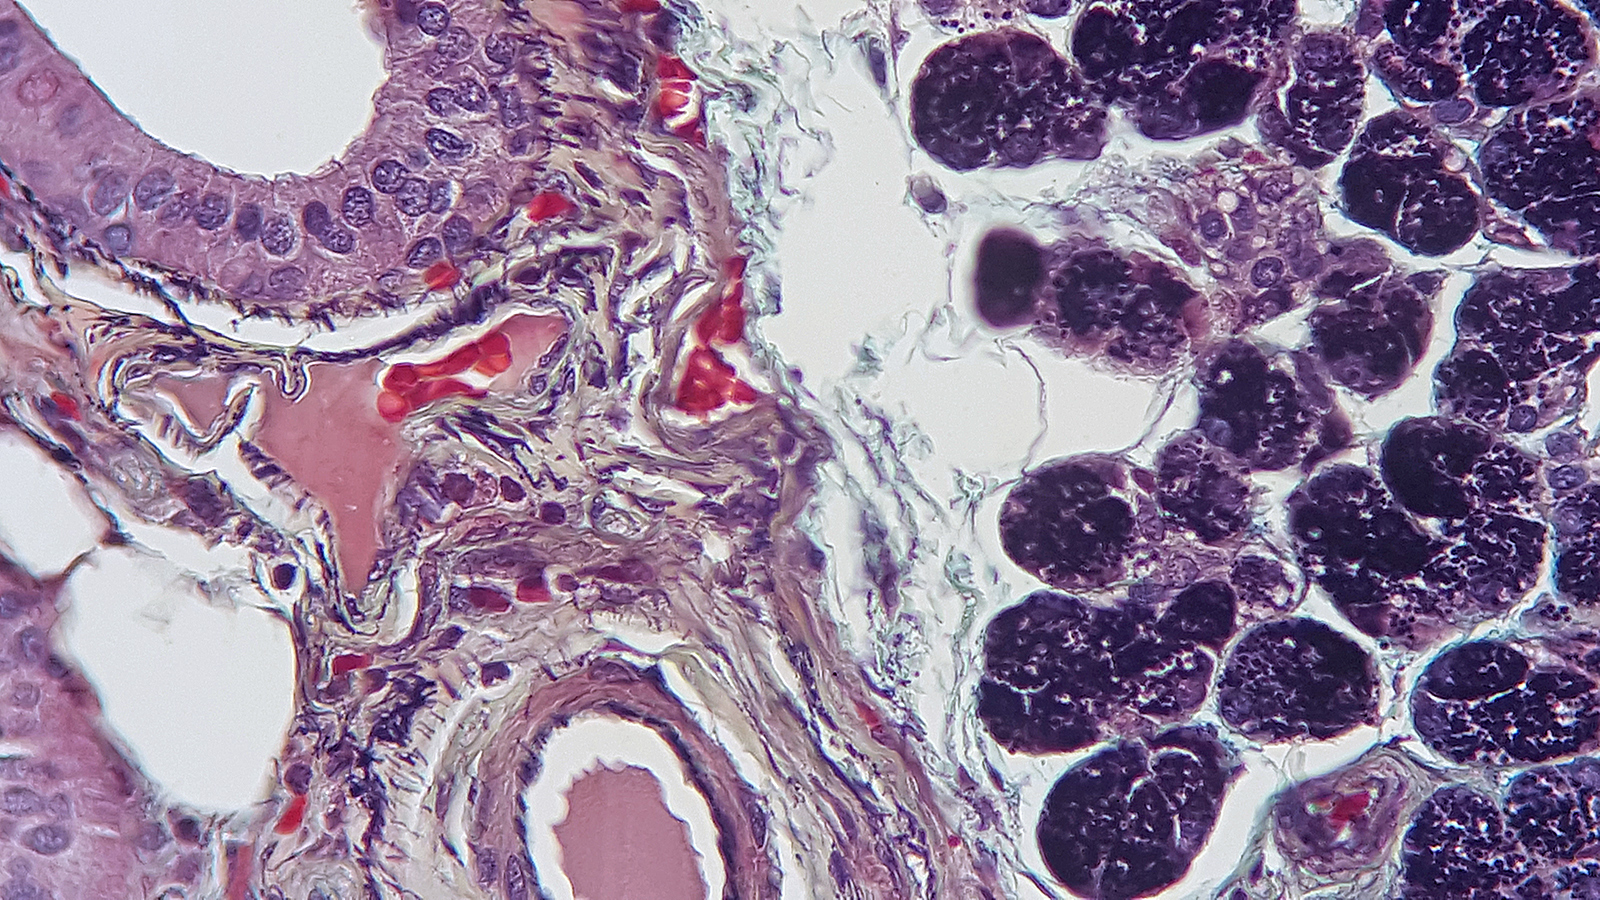 Human parotid gland